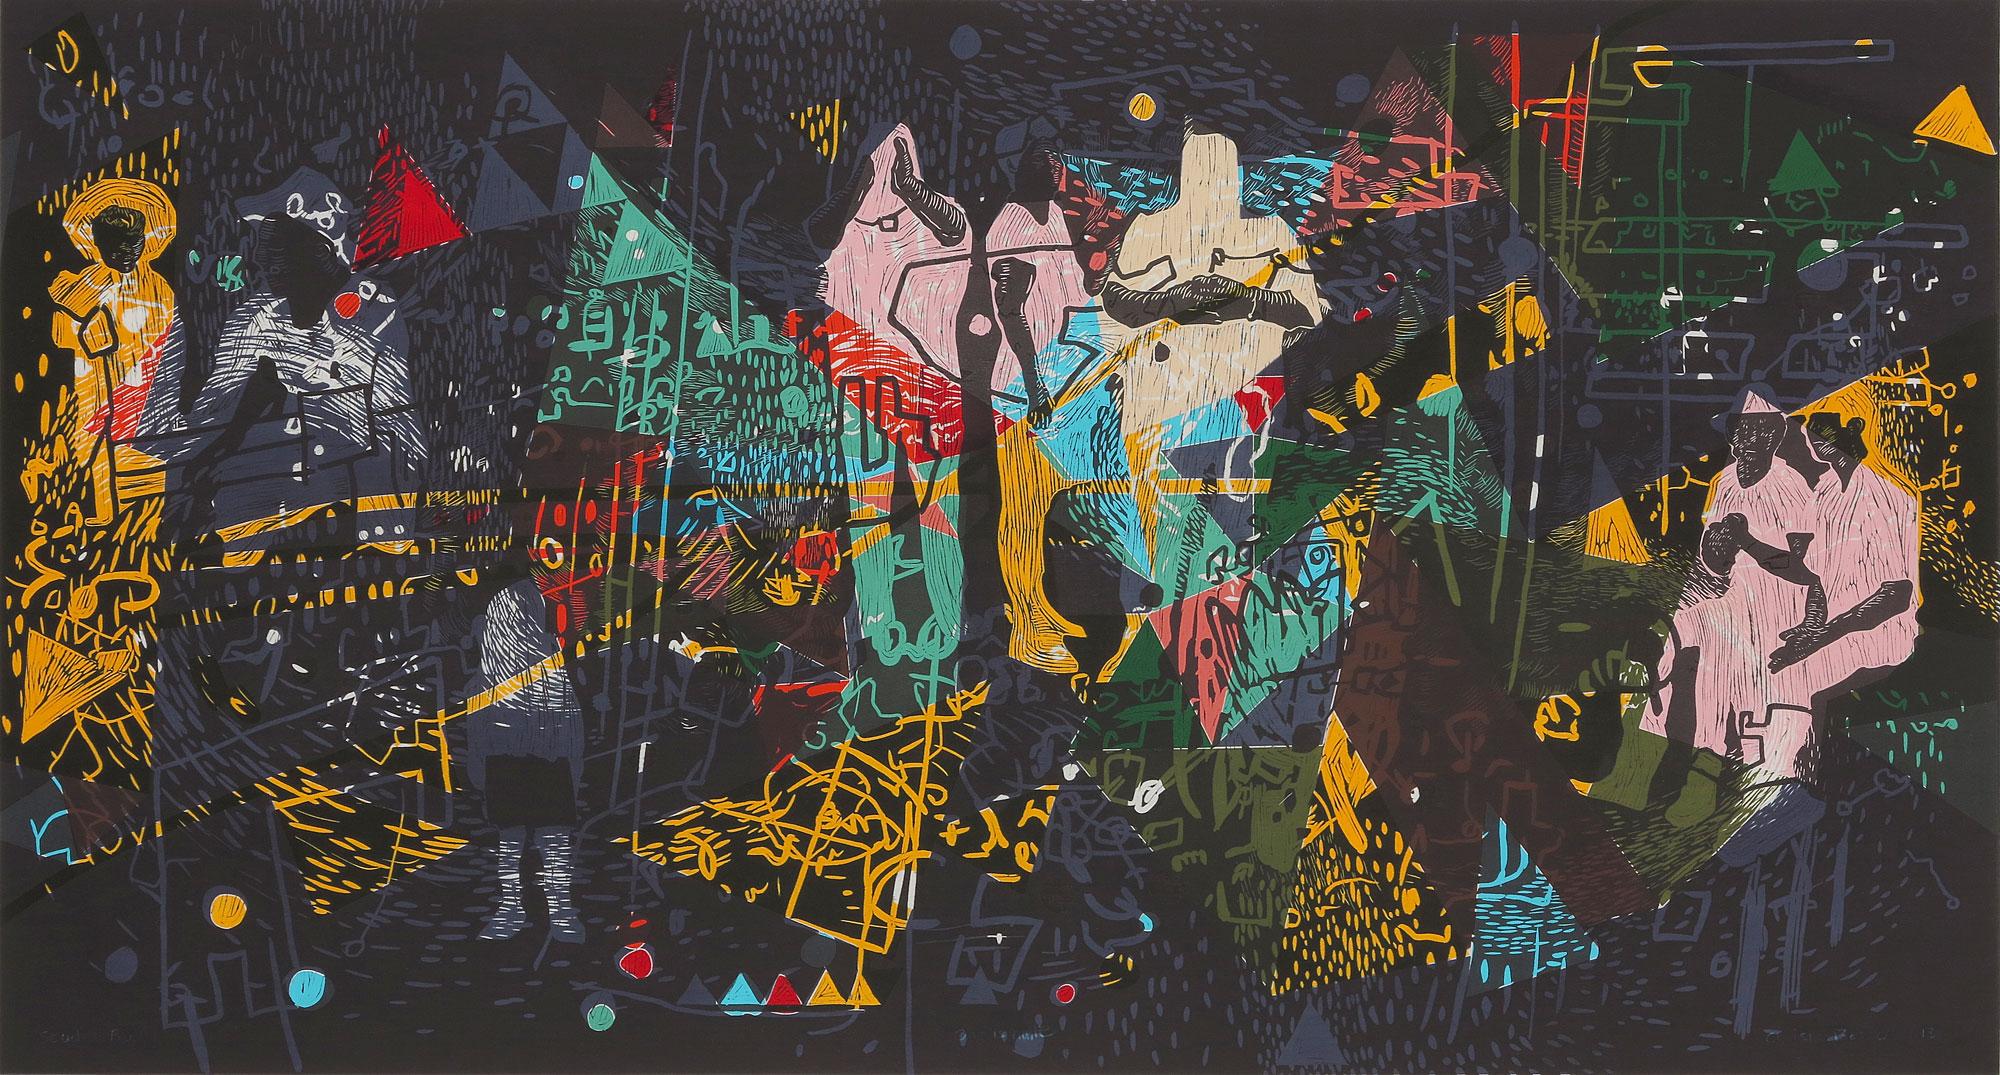 Christo-Basson_Print-Panel-2L16sfweb